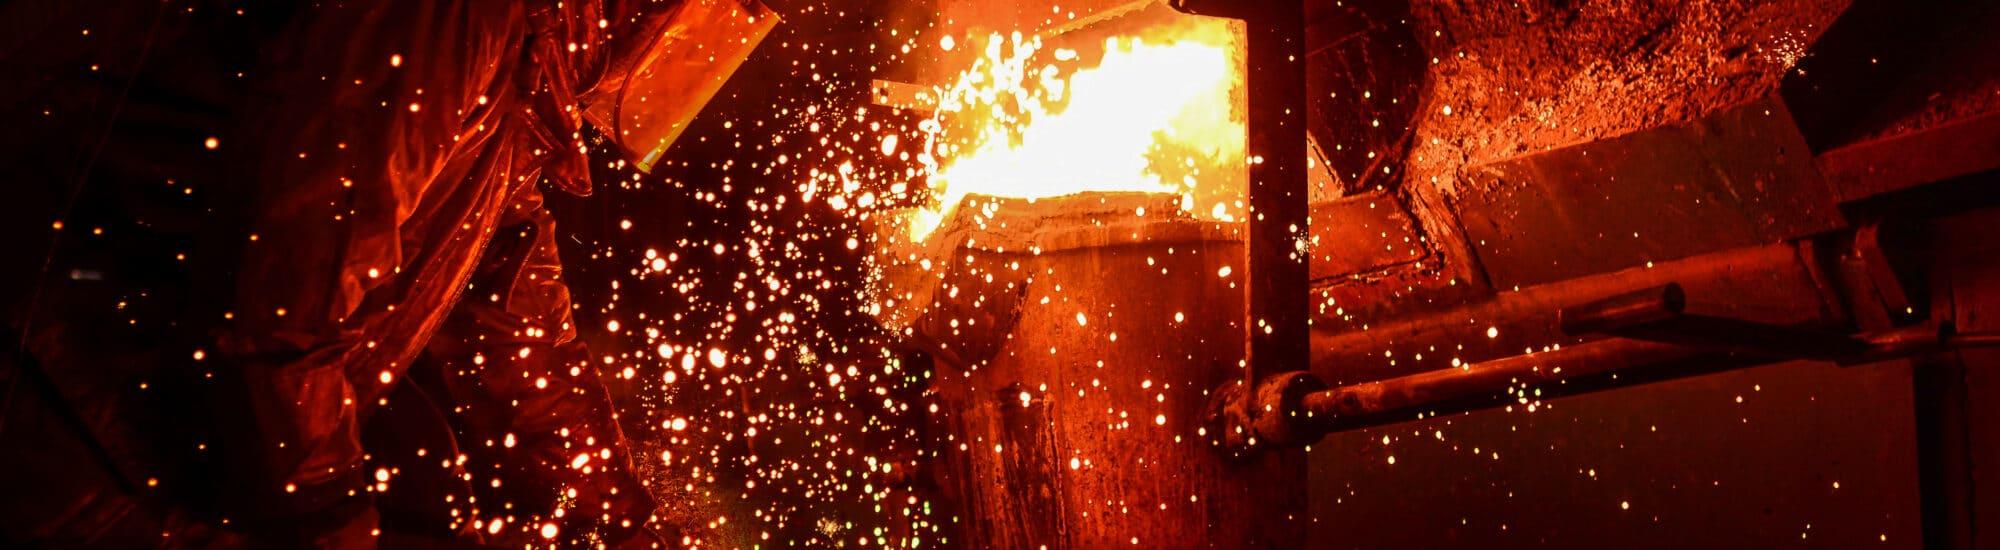 Grüner Strom in der Stahlproduktion